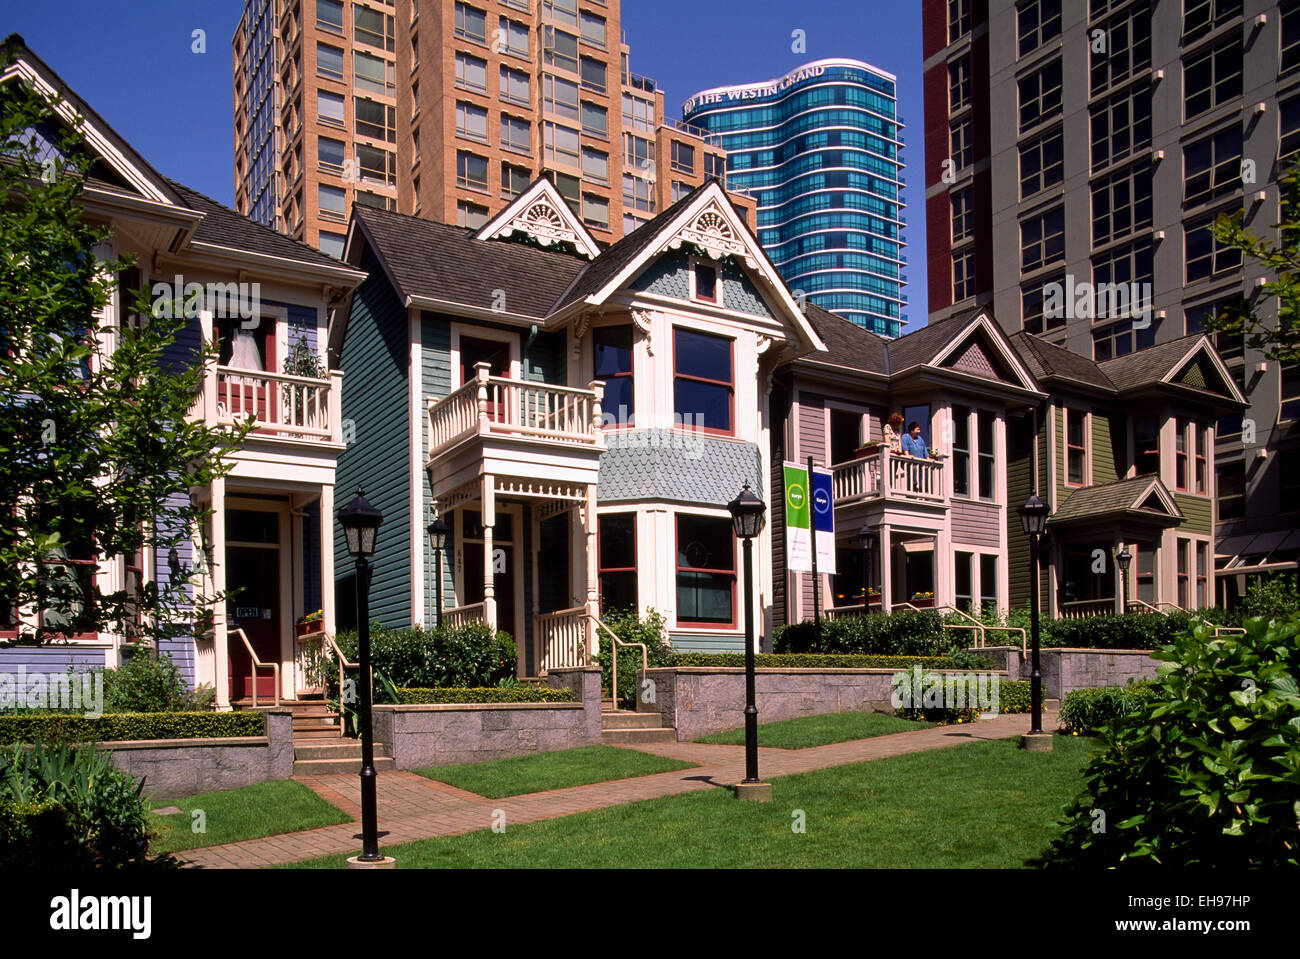 Yaletown, Vancouver, BC British Columbia, Canada - Heritage